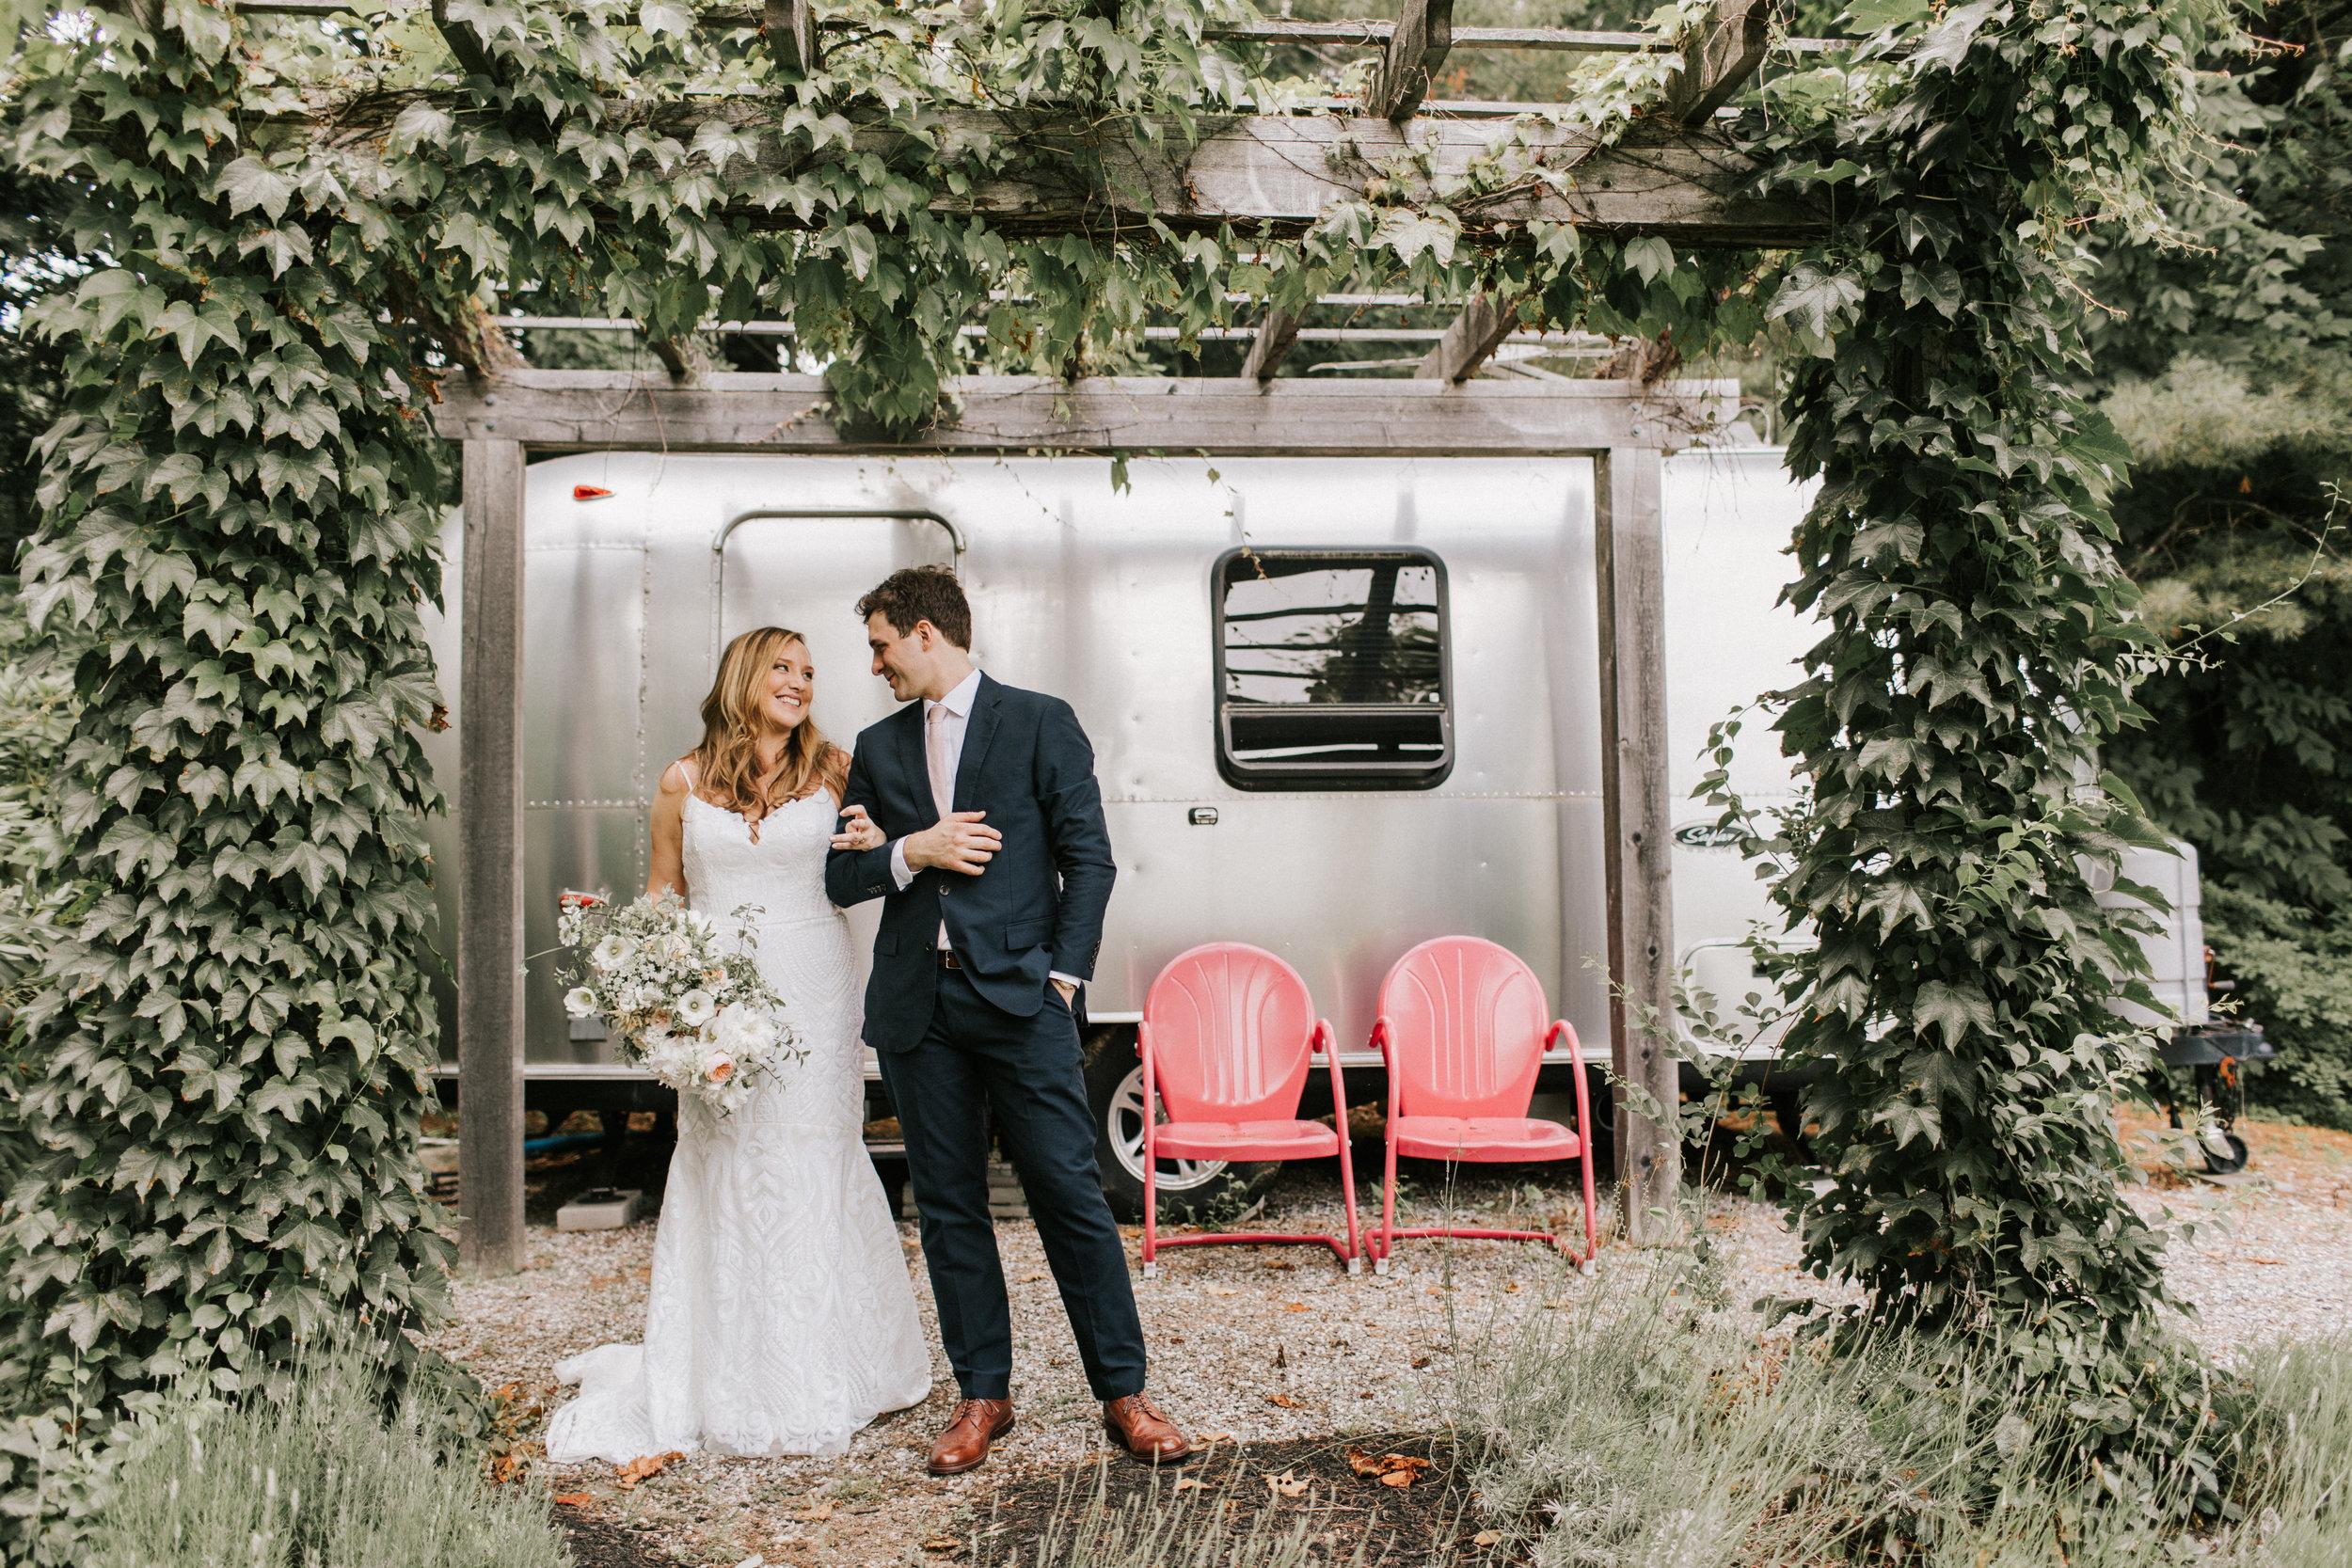 Watershed_Floral_Marianmade_Farm_Wedding_JamieMercurioPhoto2018-99.jpg